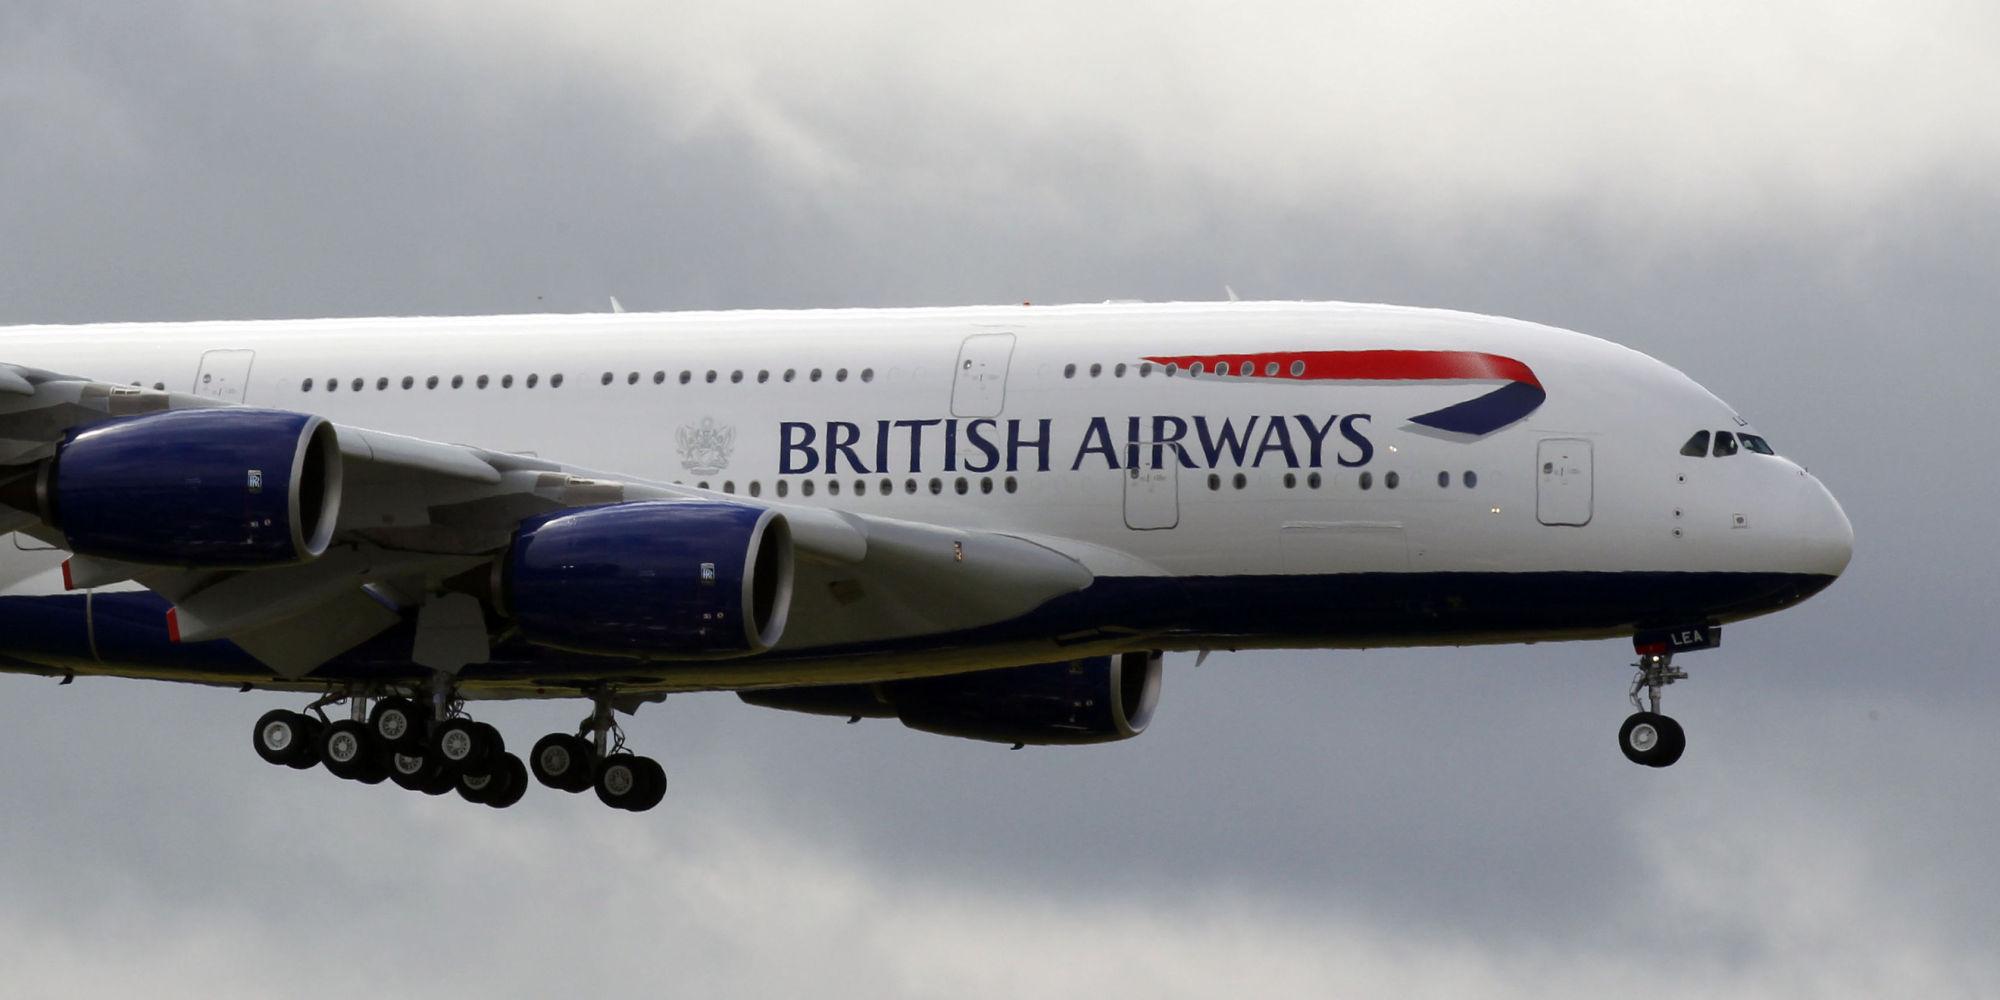 british airways - photo #17